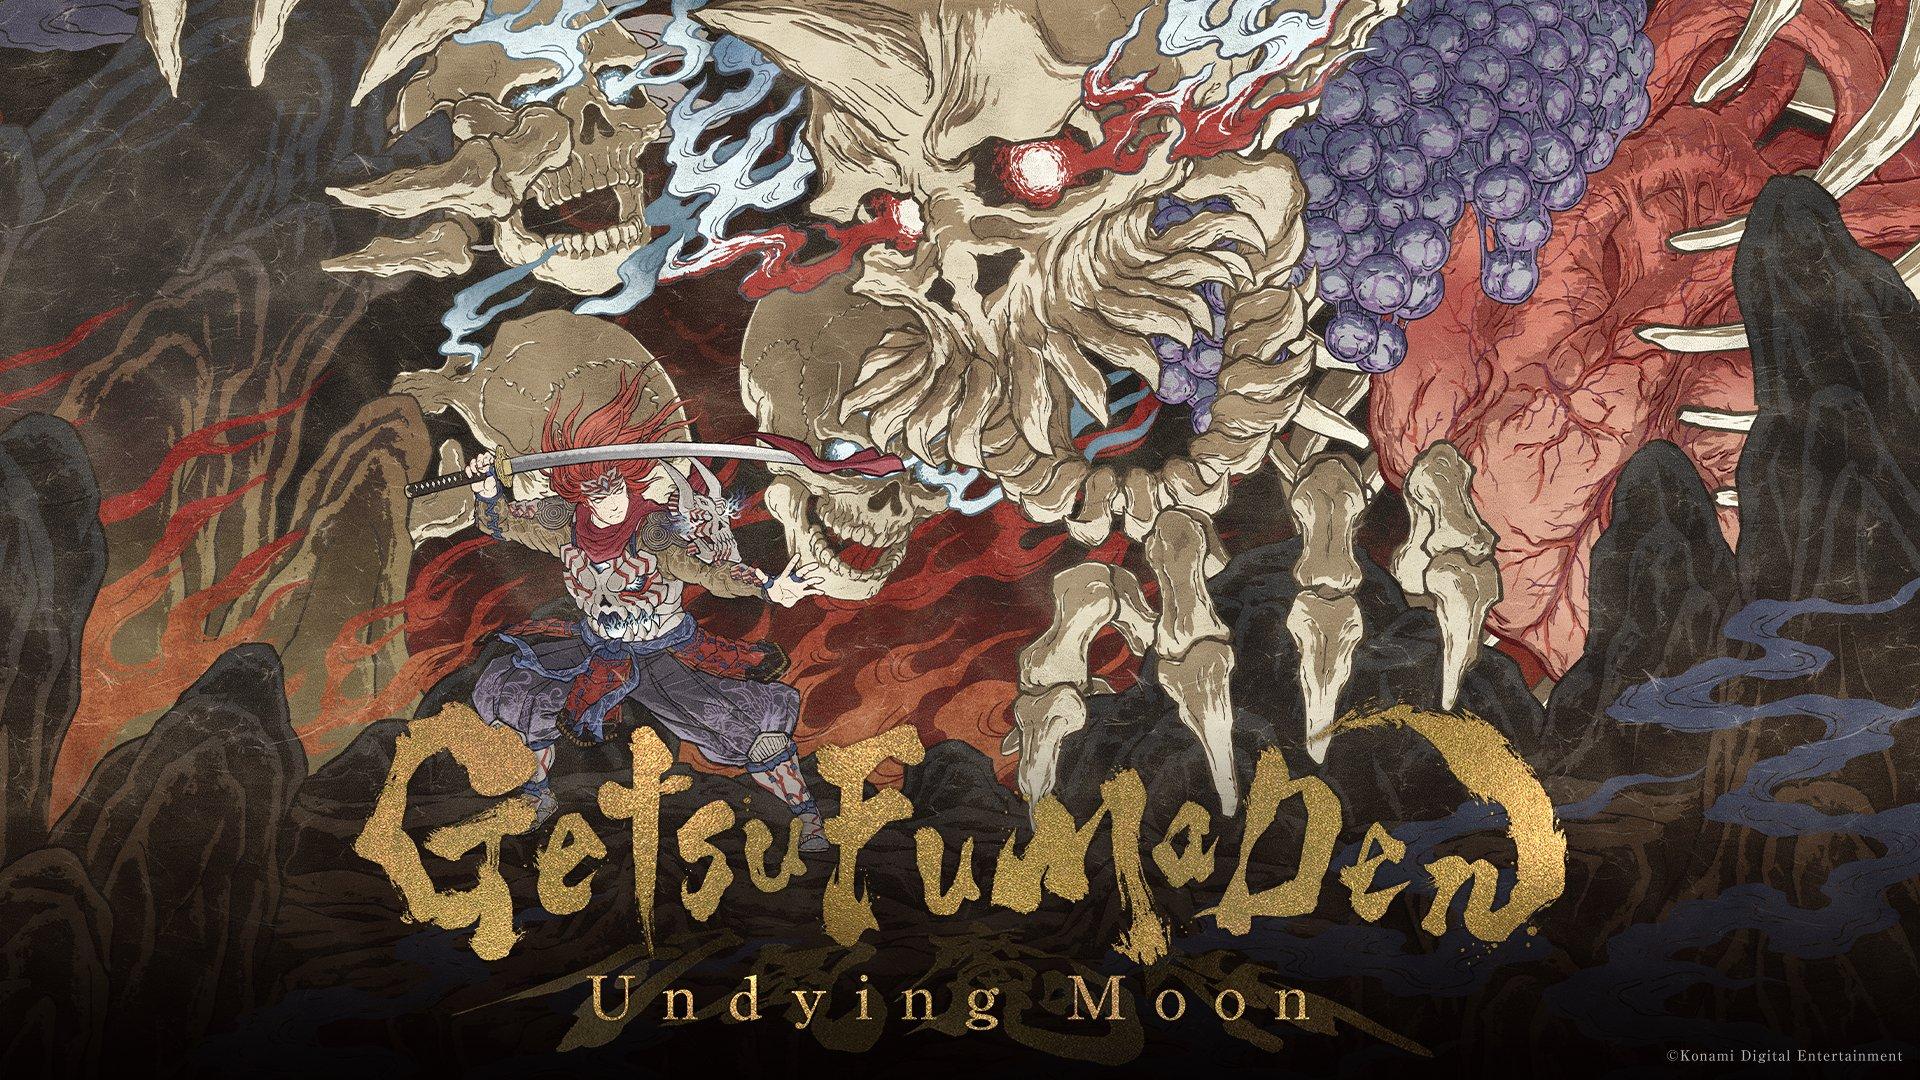 Přehled novinek z Japonska 15. týdne GetsuFumaDen Undying Moon Key Art